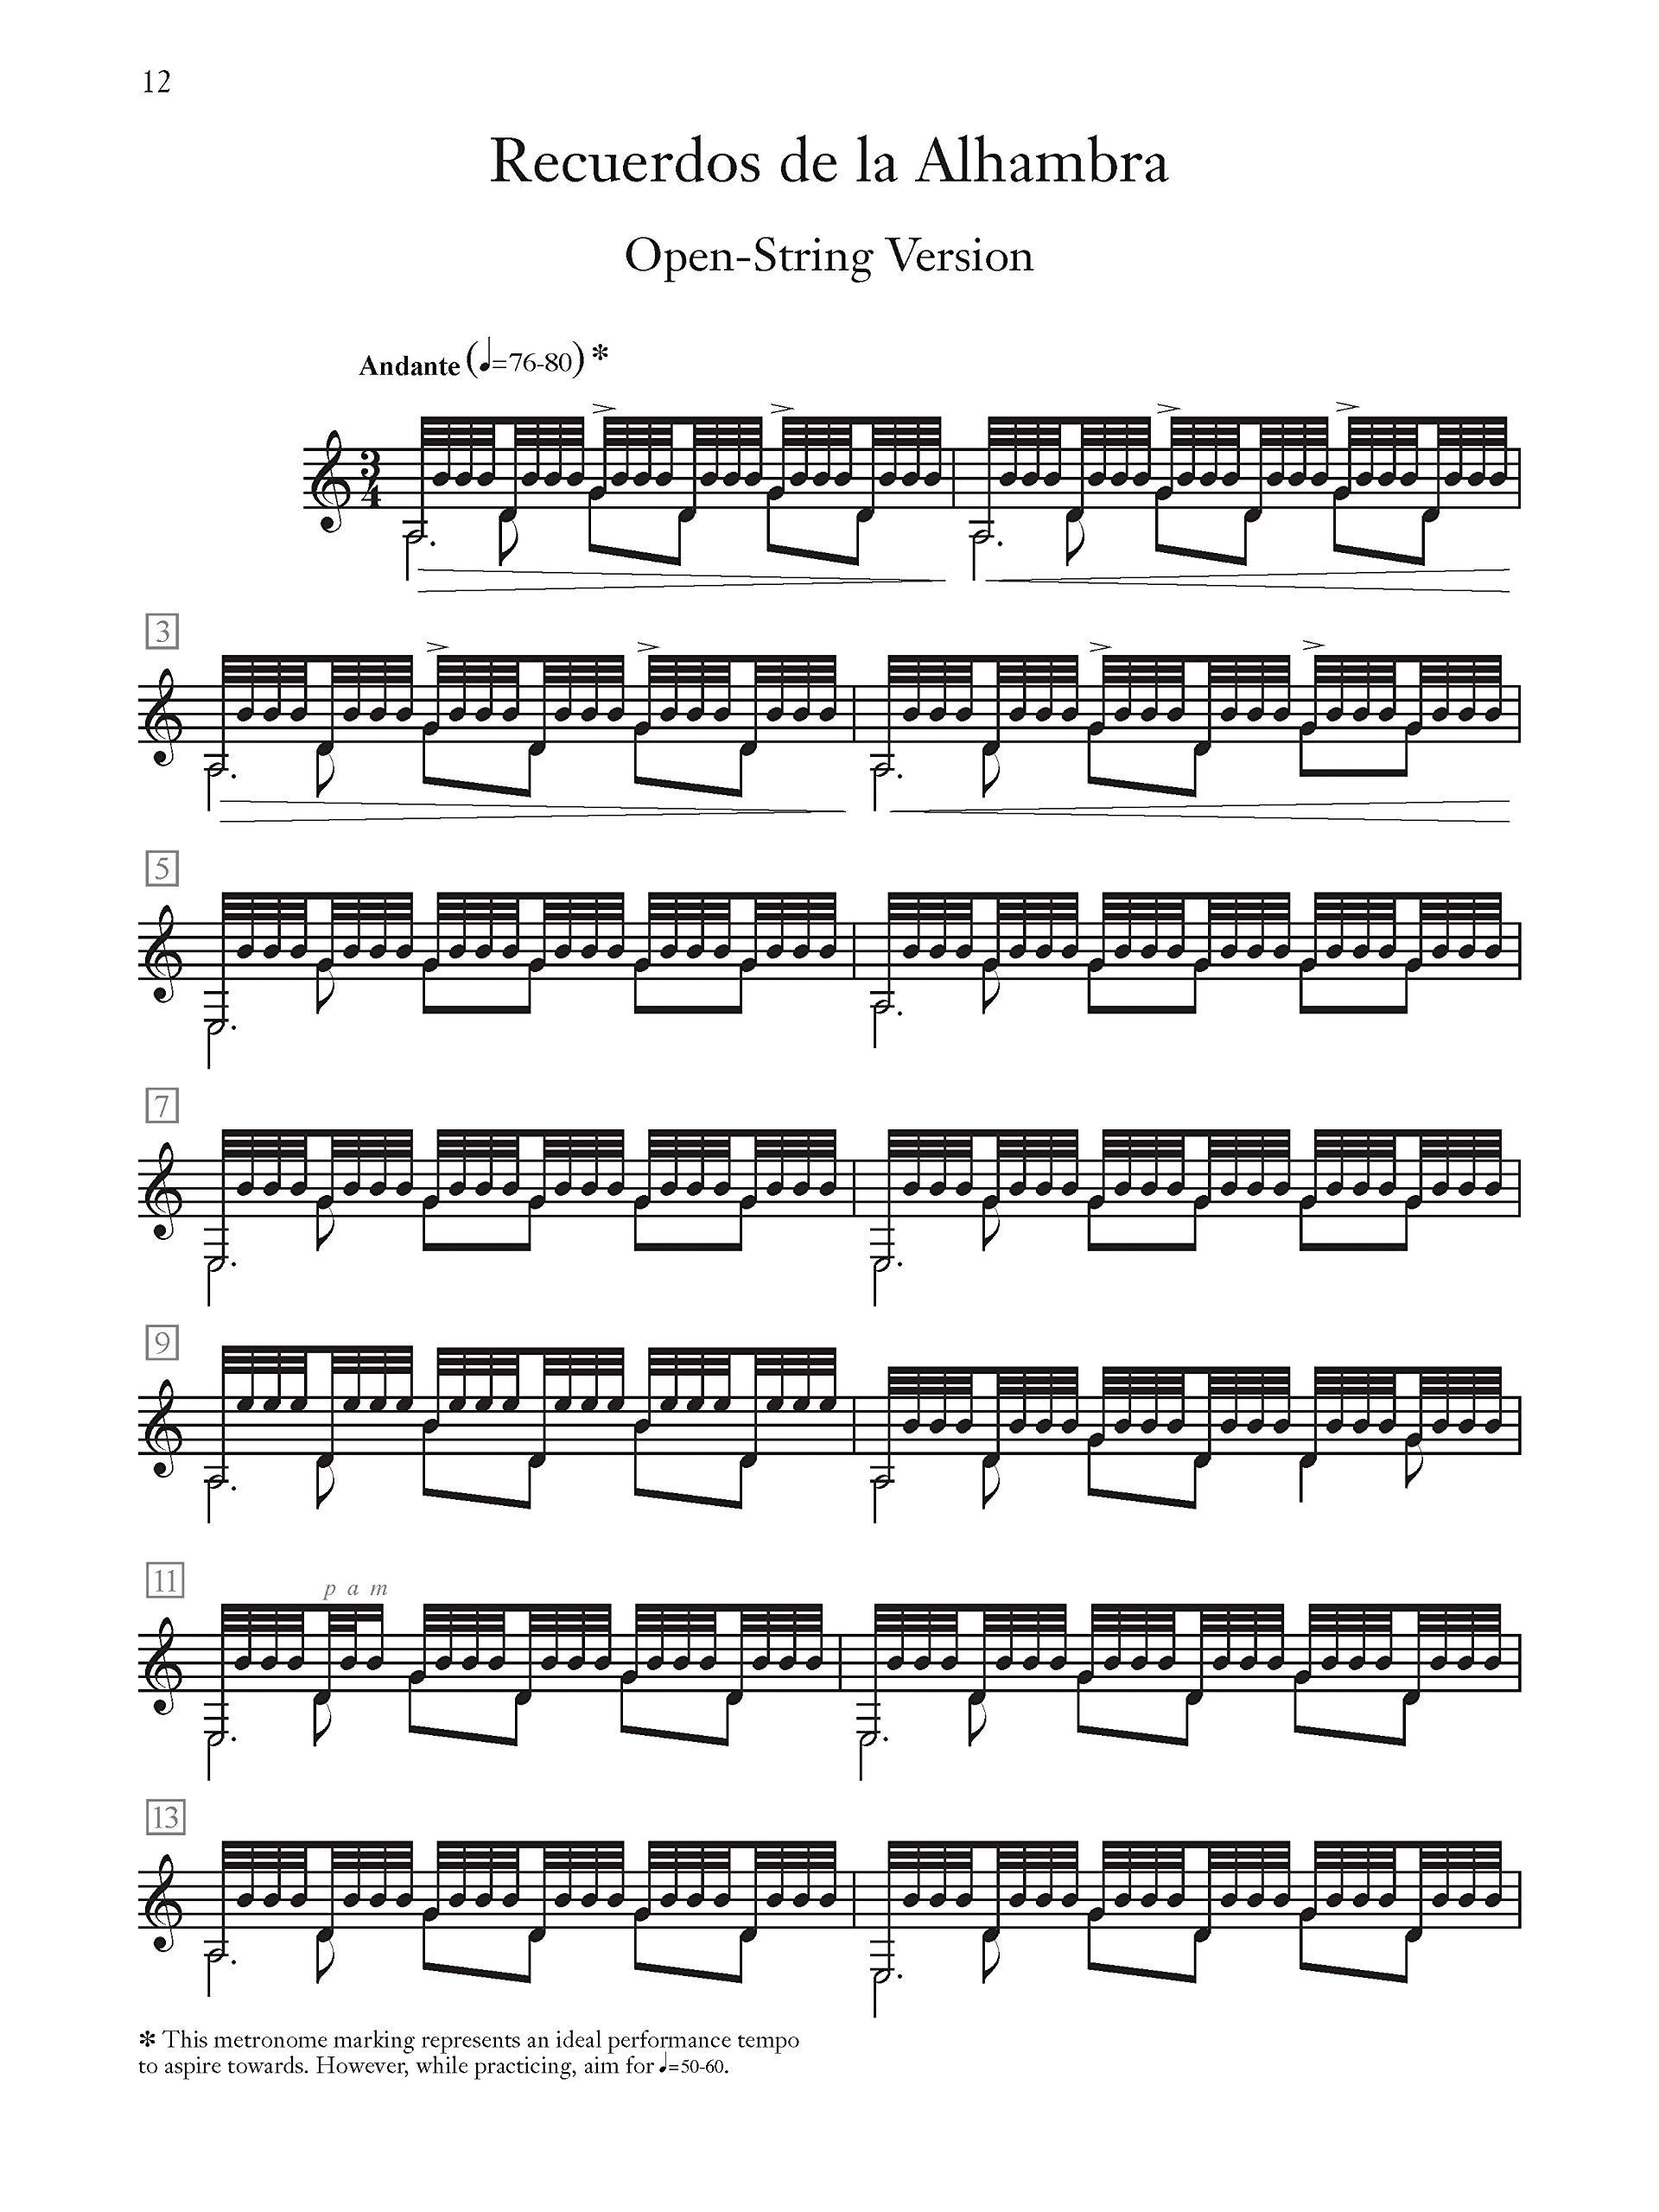 Tárrega -- Recuerdos de la Alhambra Alfred Classical Guitar ...